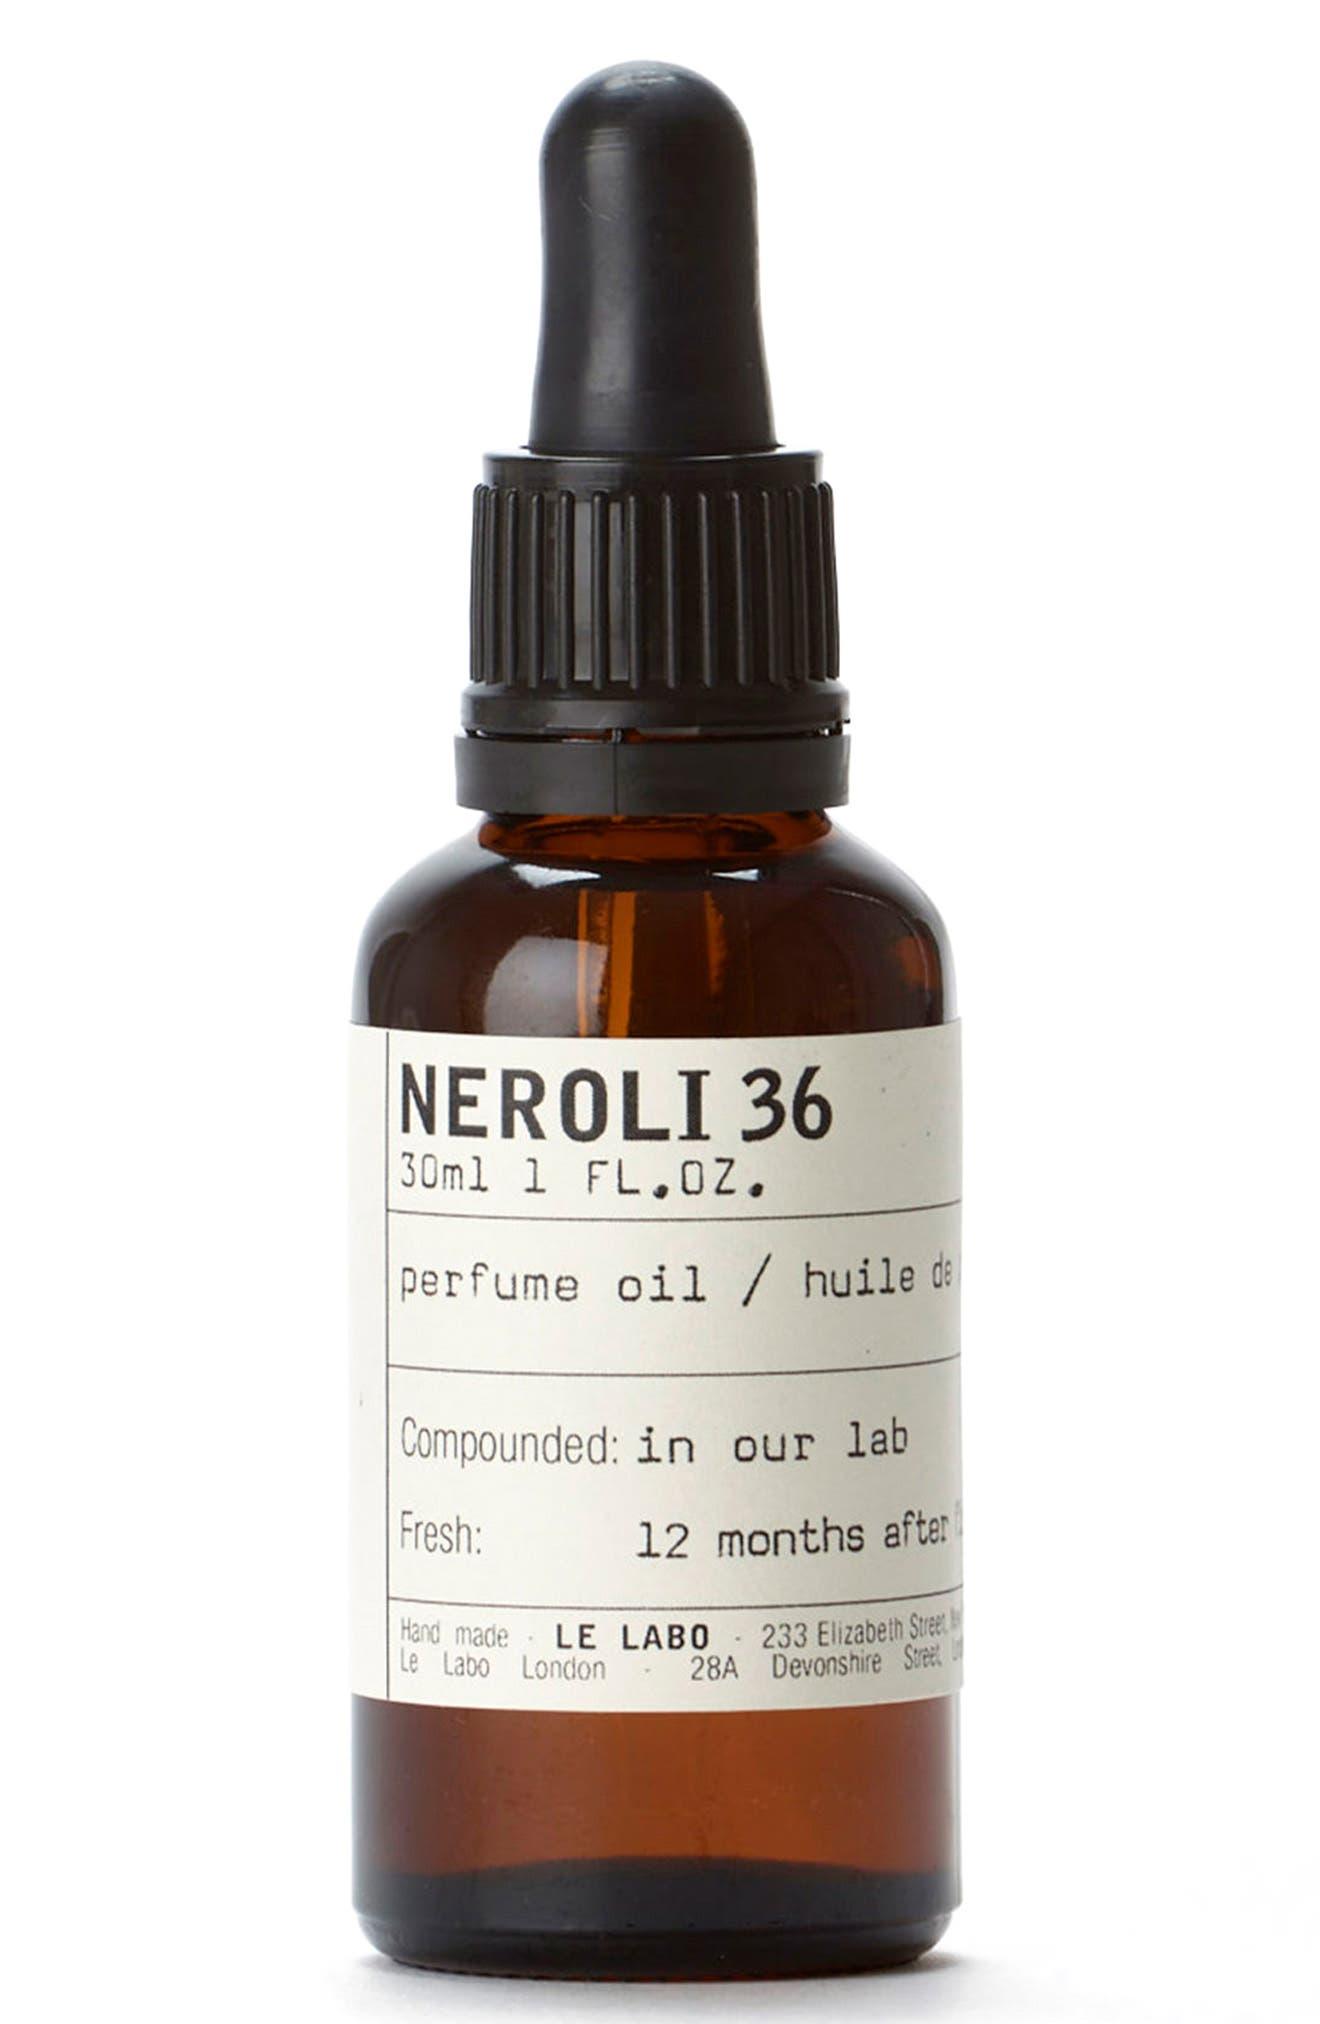 Le Labo 'Neroli 36' Perfume Oil